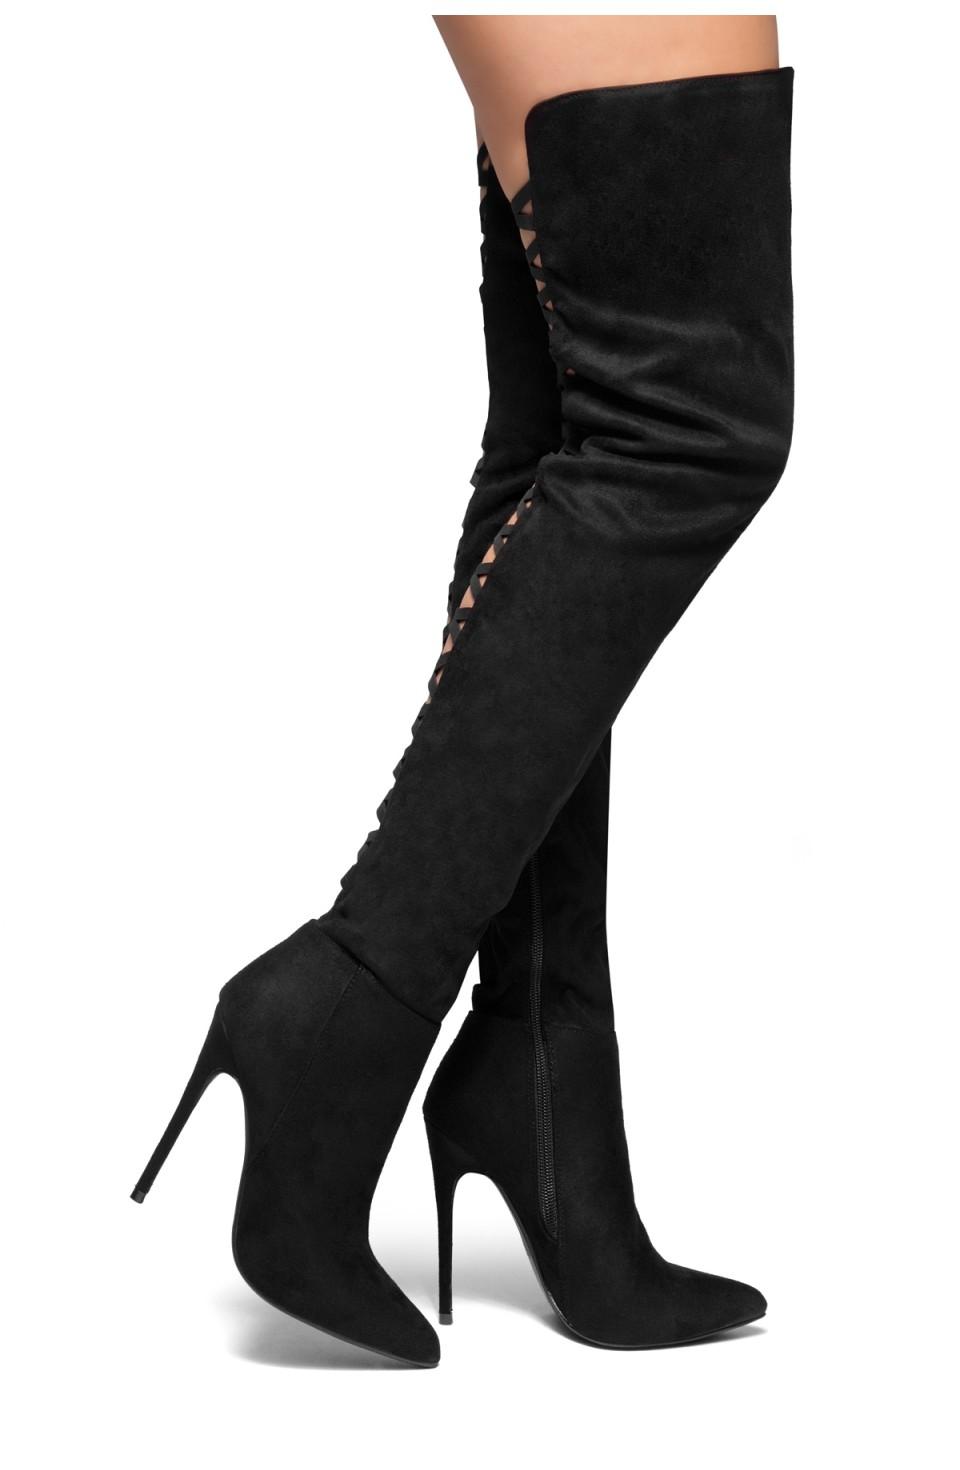 HerStyle Night Moves-Stiletto heel, thigh high (Black)